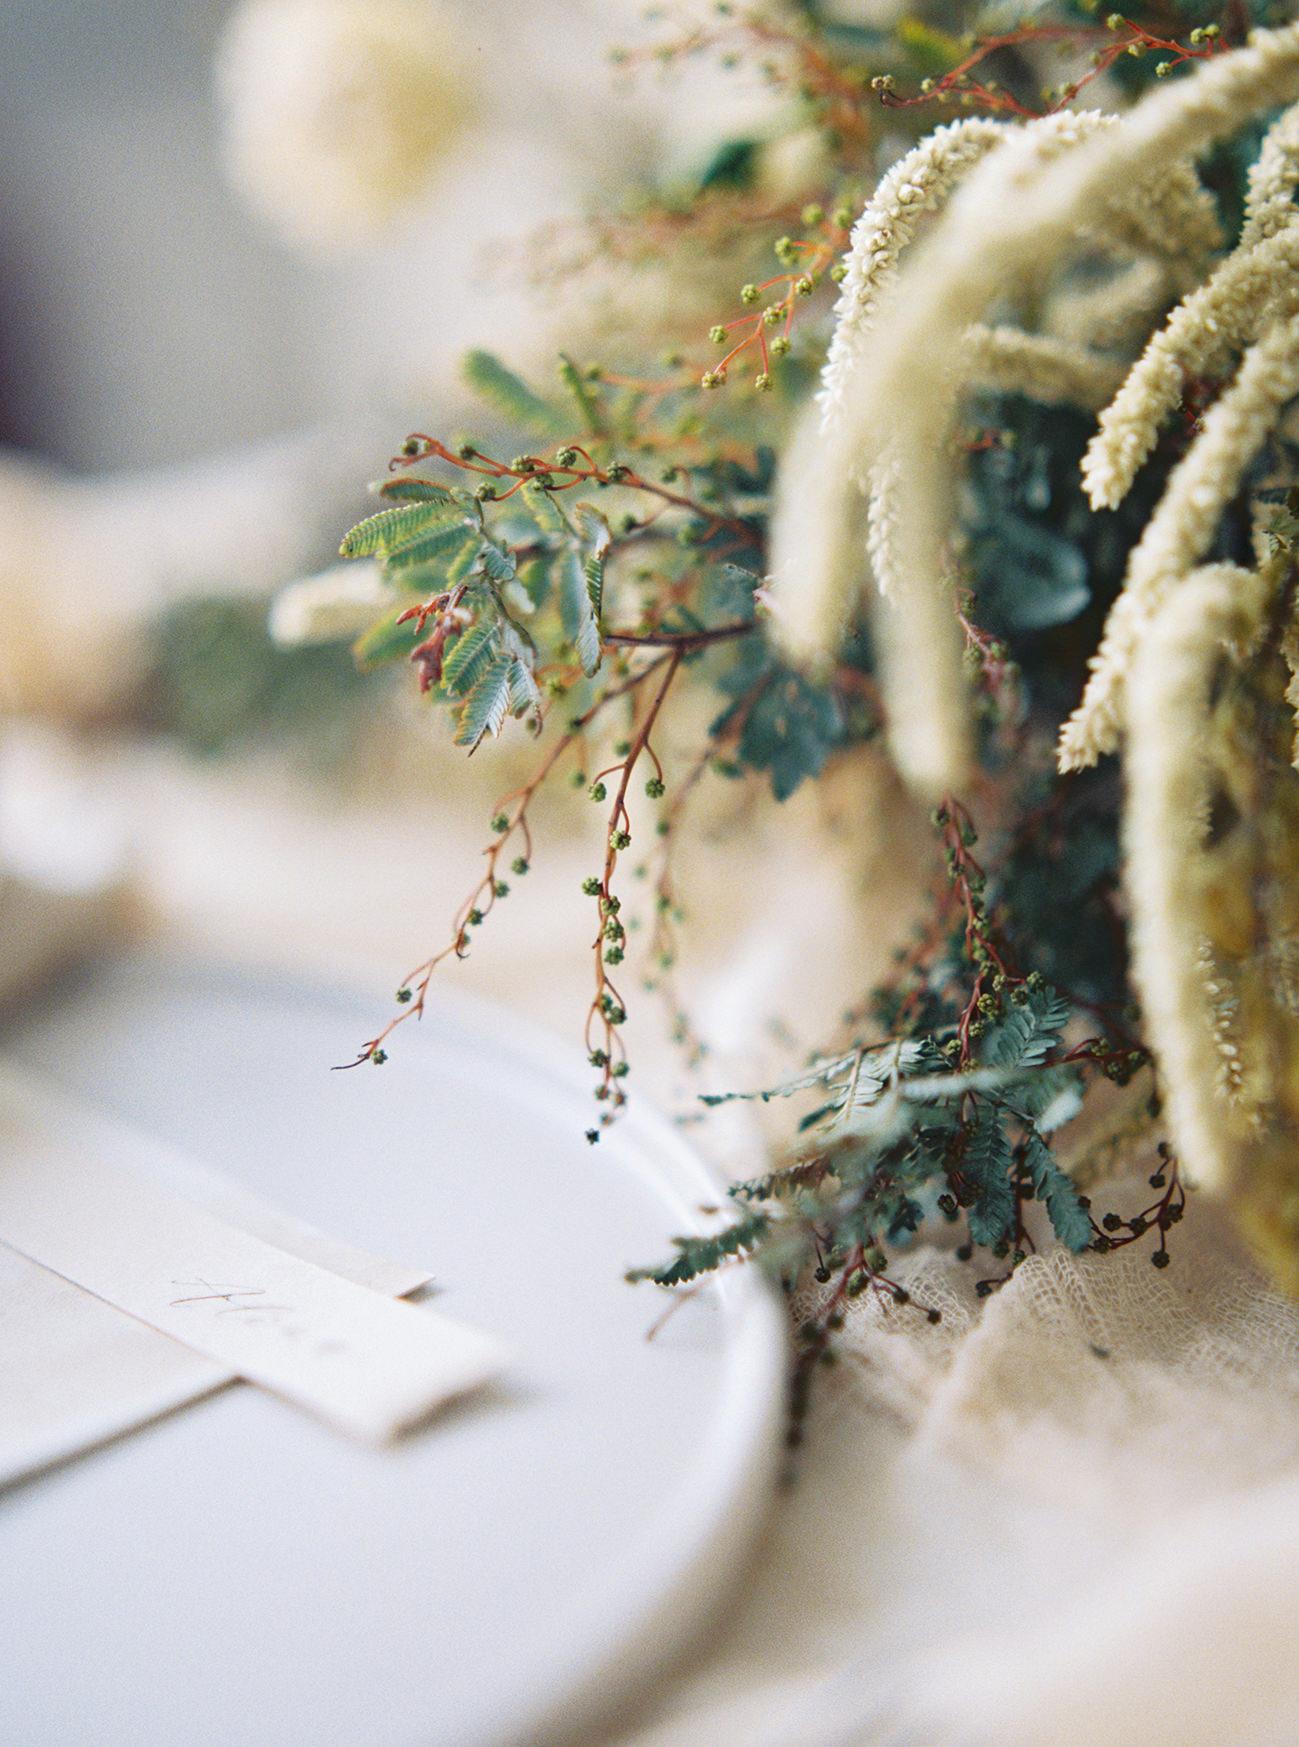 Bridal Inspiration, Wedding Bouquet, Hääkuvaus, Film Wedding Photographer, Table Setting Inspiration, Stationery, Dried Flowers, www.nordandmae.com, www.susannanordvall (29).jpg